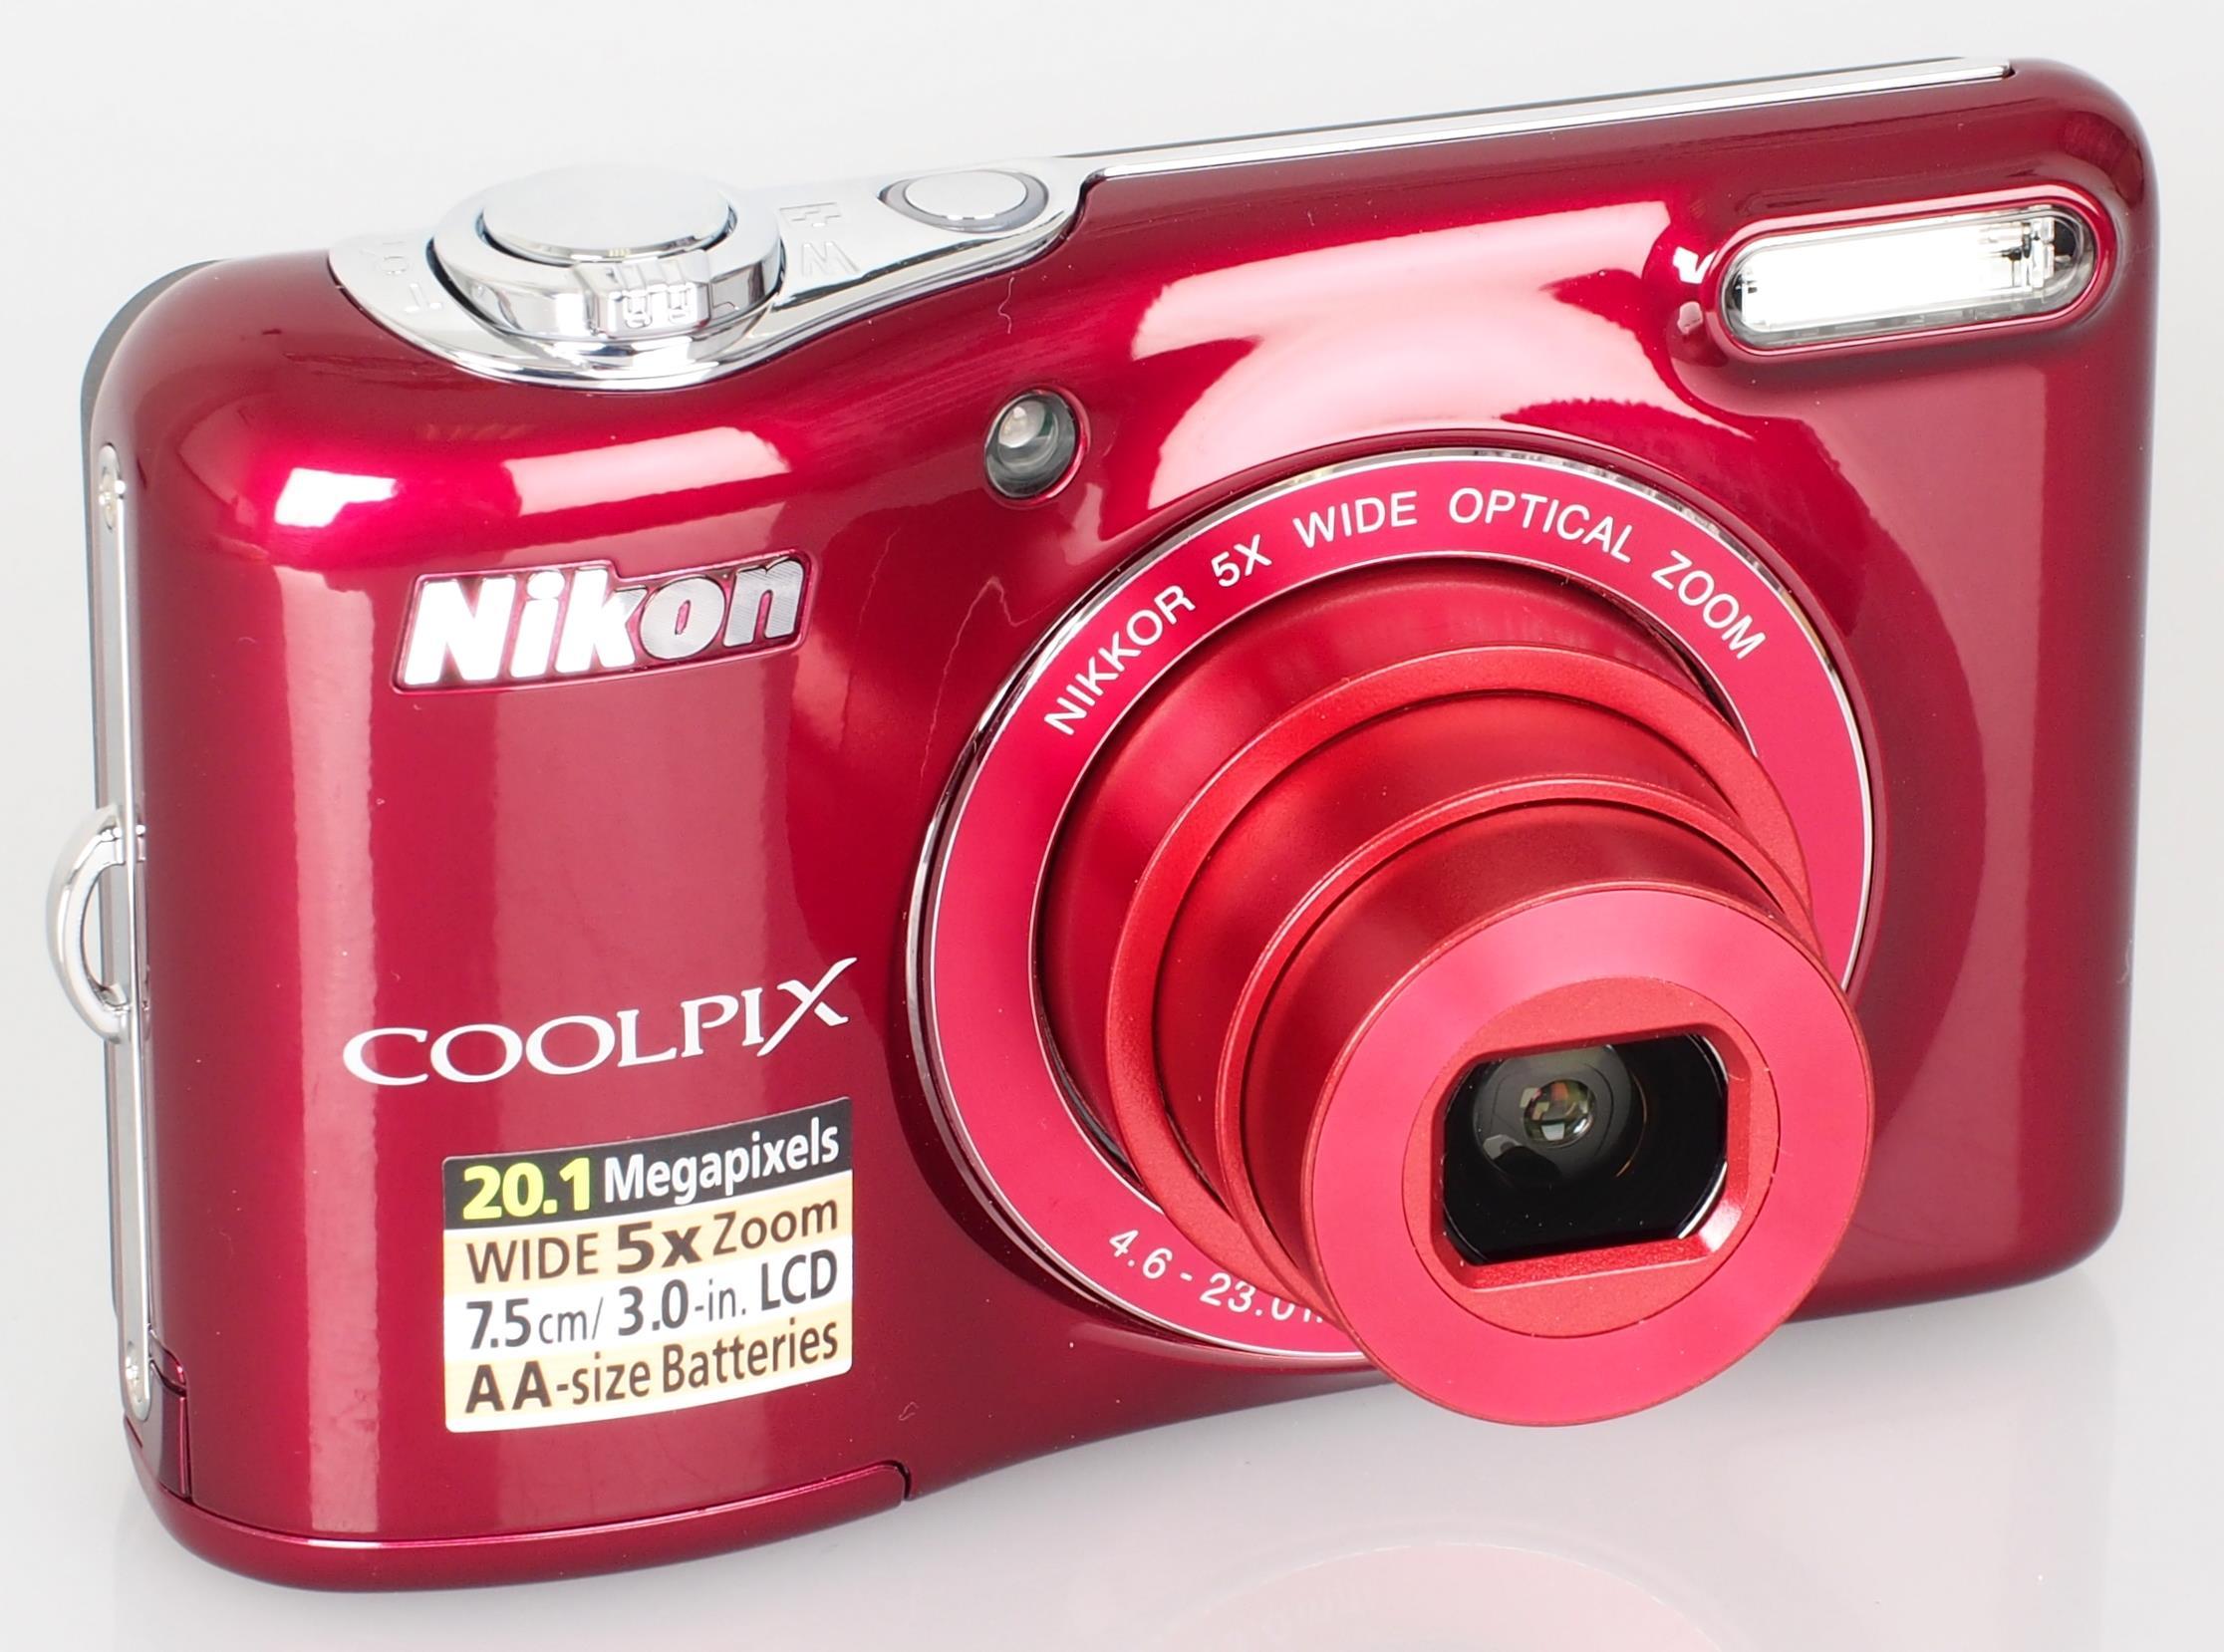 Nikon Coolpix L830 Image